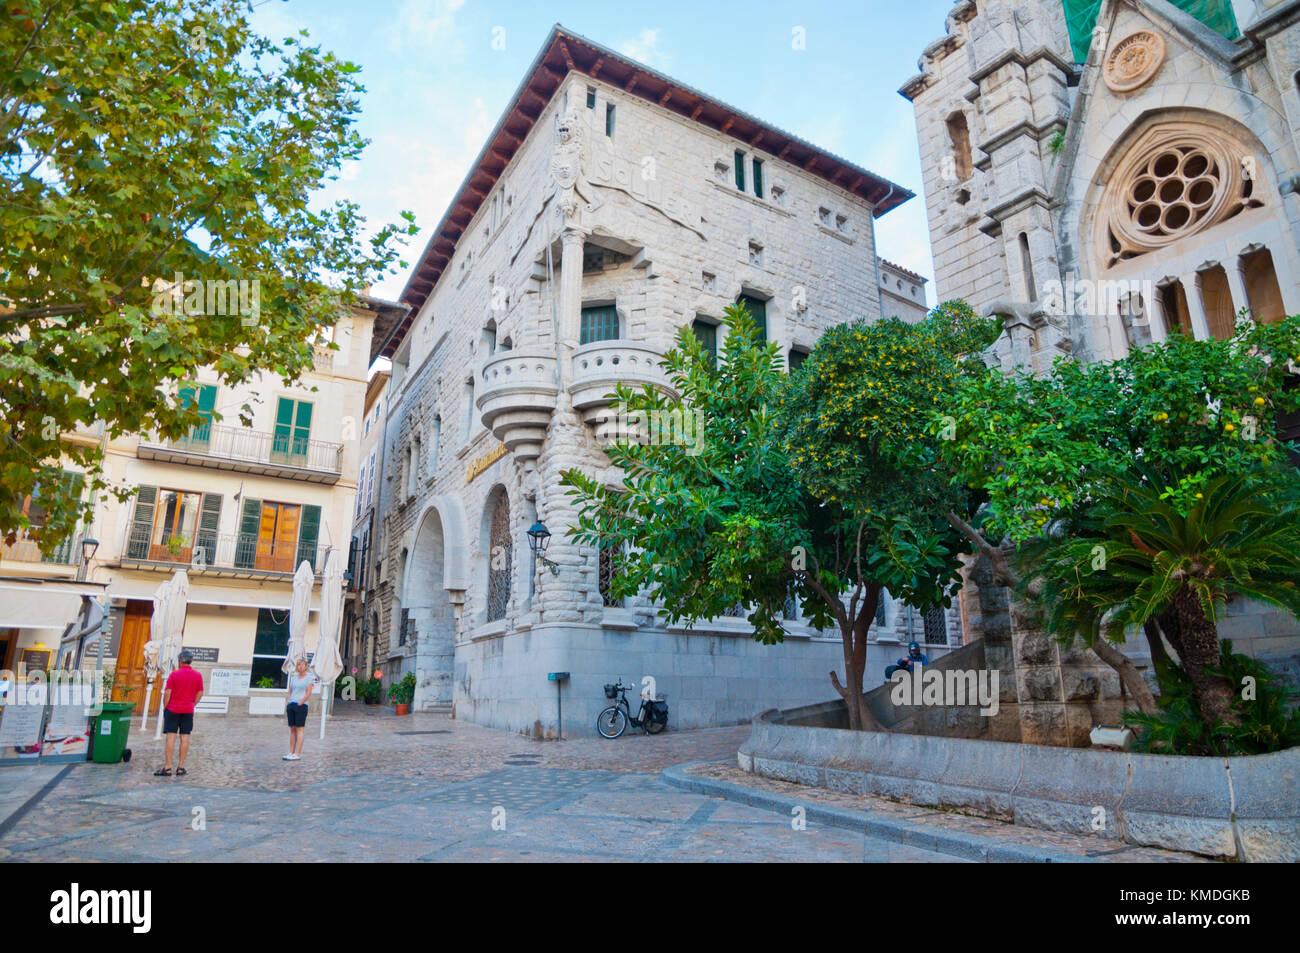 Placa de sa Constitucio, main square, with Banco de Soller building, designed by Joan Rubio i Bellver, Soller, Mallorca, - Stock Image